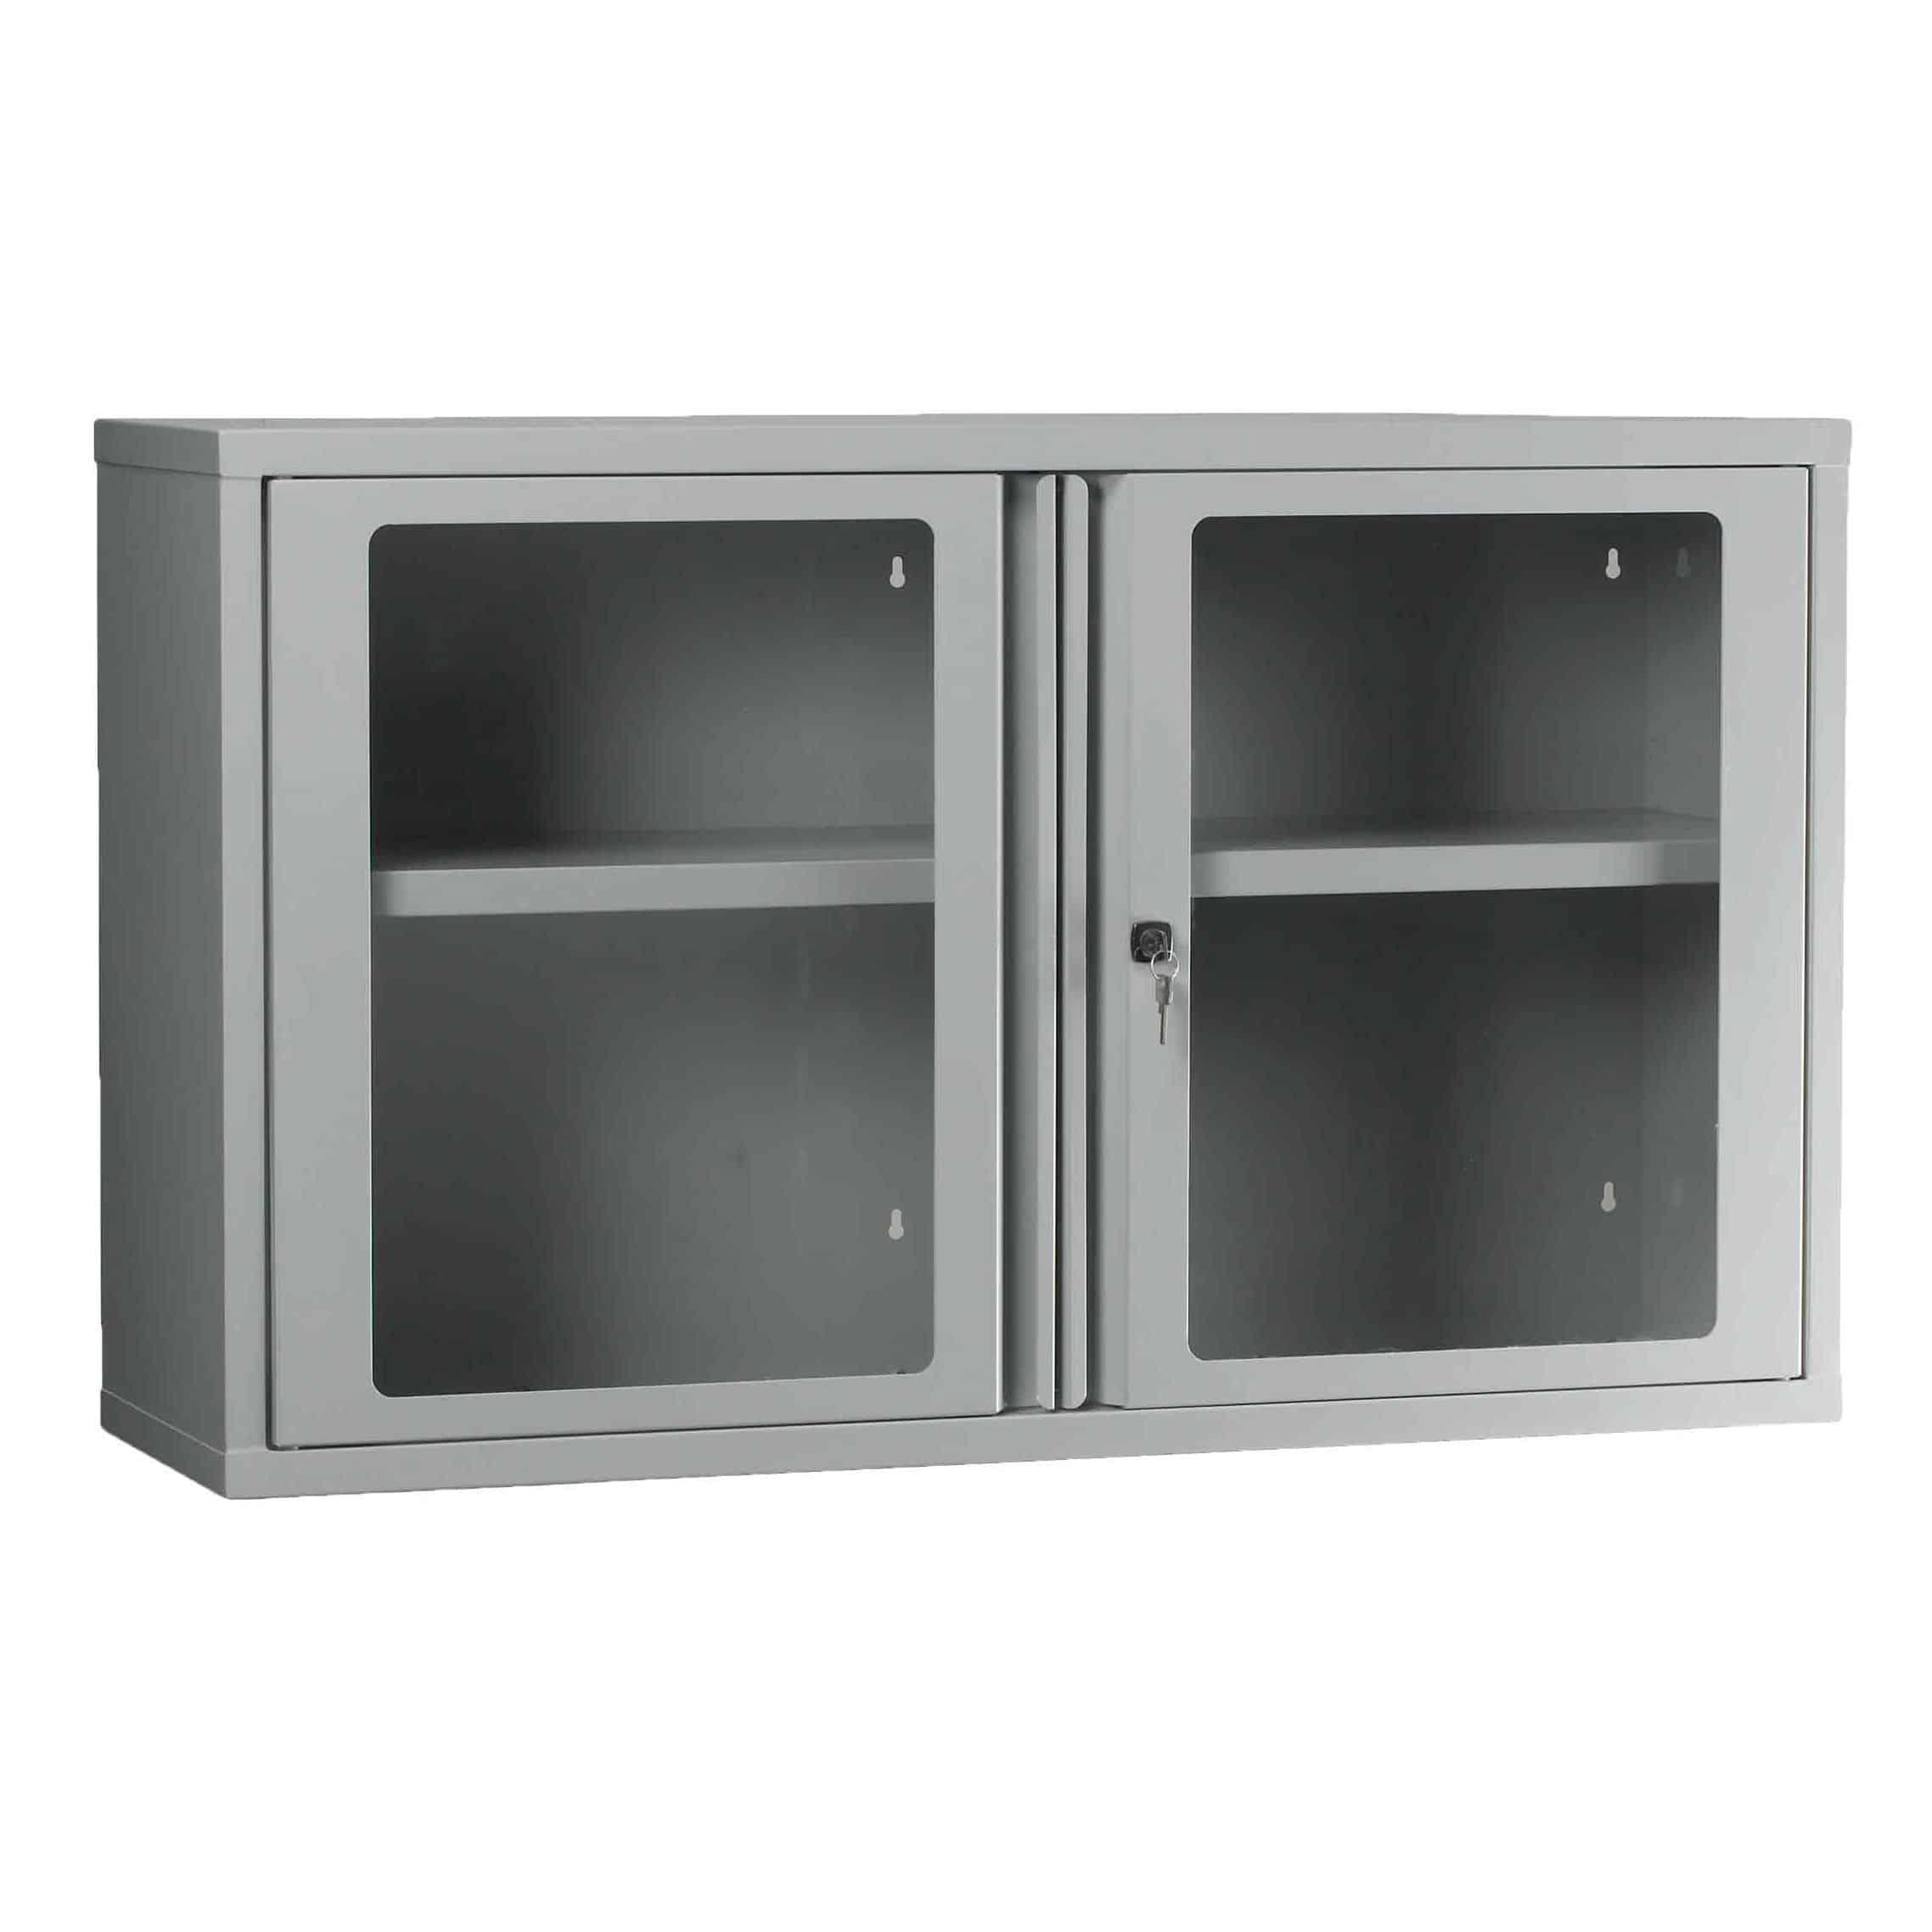 Polycarbonate Door Wall Cabinets